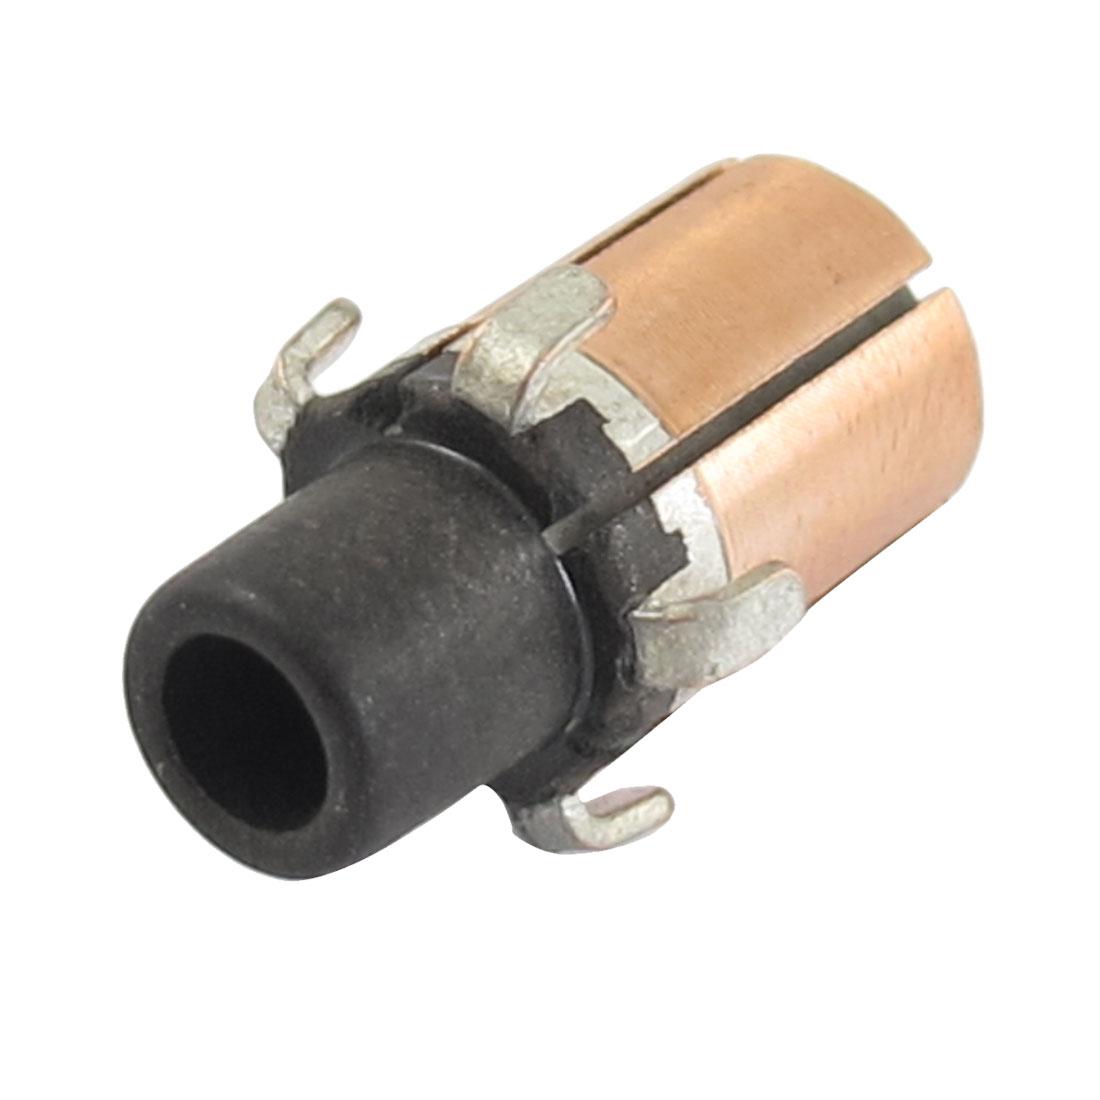 3.175mm x 7.6mm x 16mm 5P Copper Bars Alternator Electric Motor Commutator